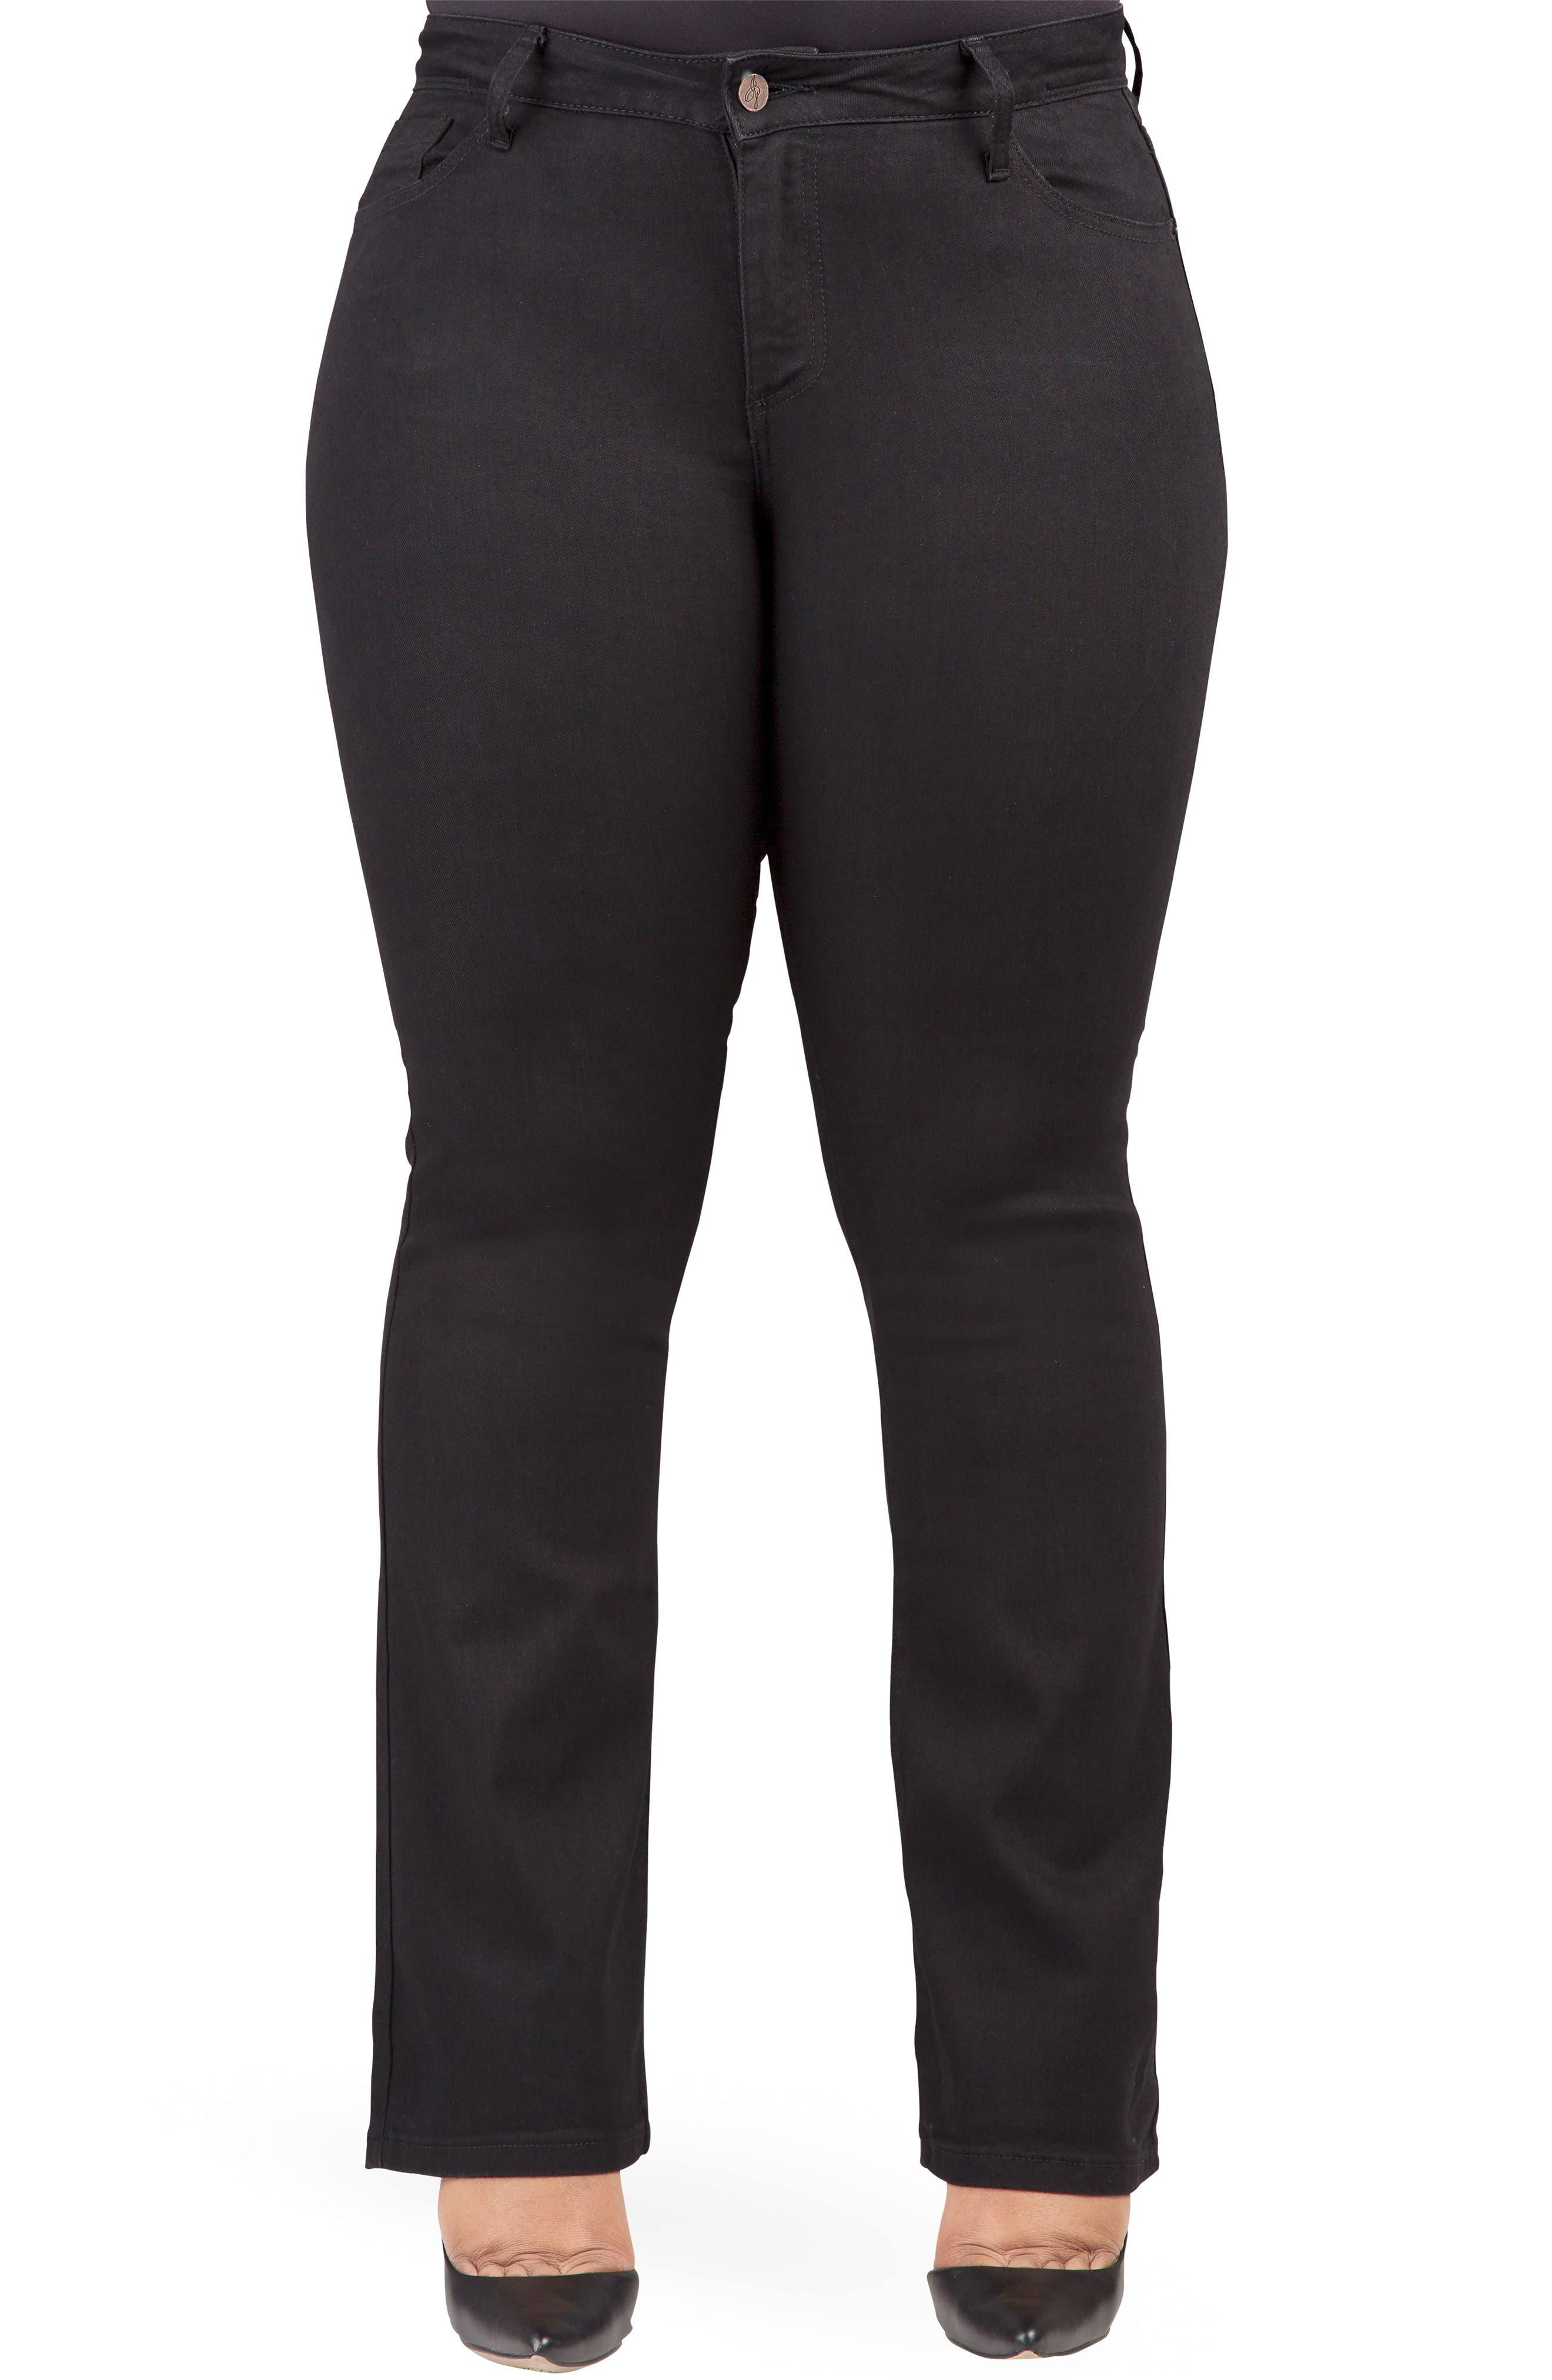 Scarlett Slim Bootcut Curvy Fit Jeans,                         Main,                         color, Rinse Black